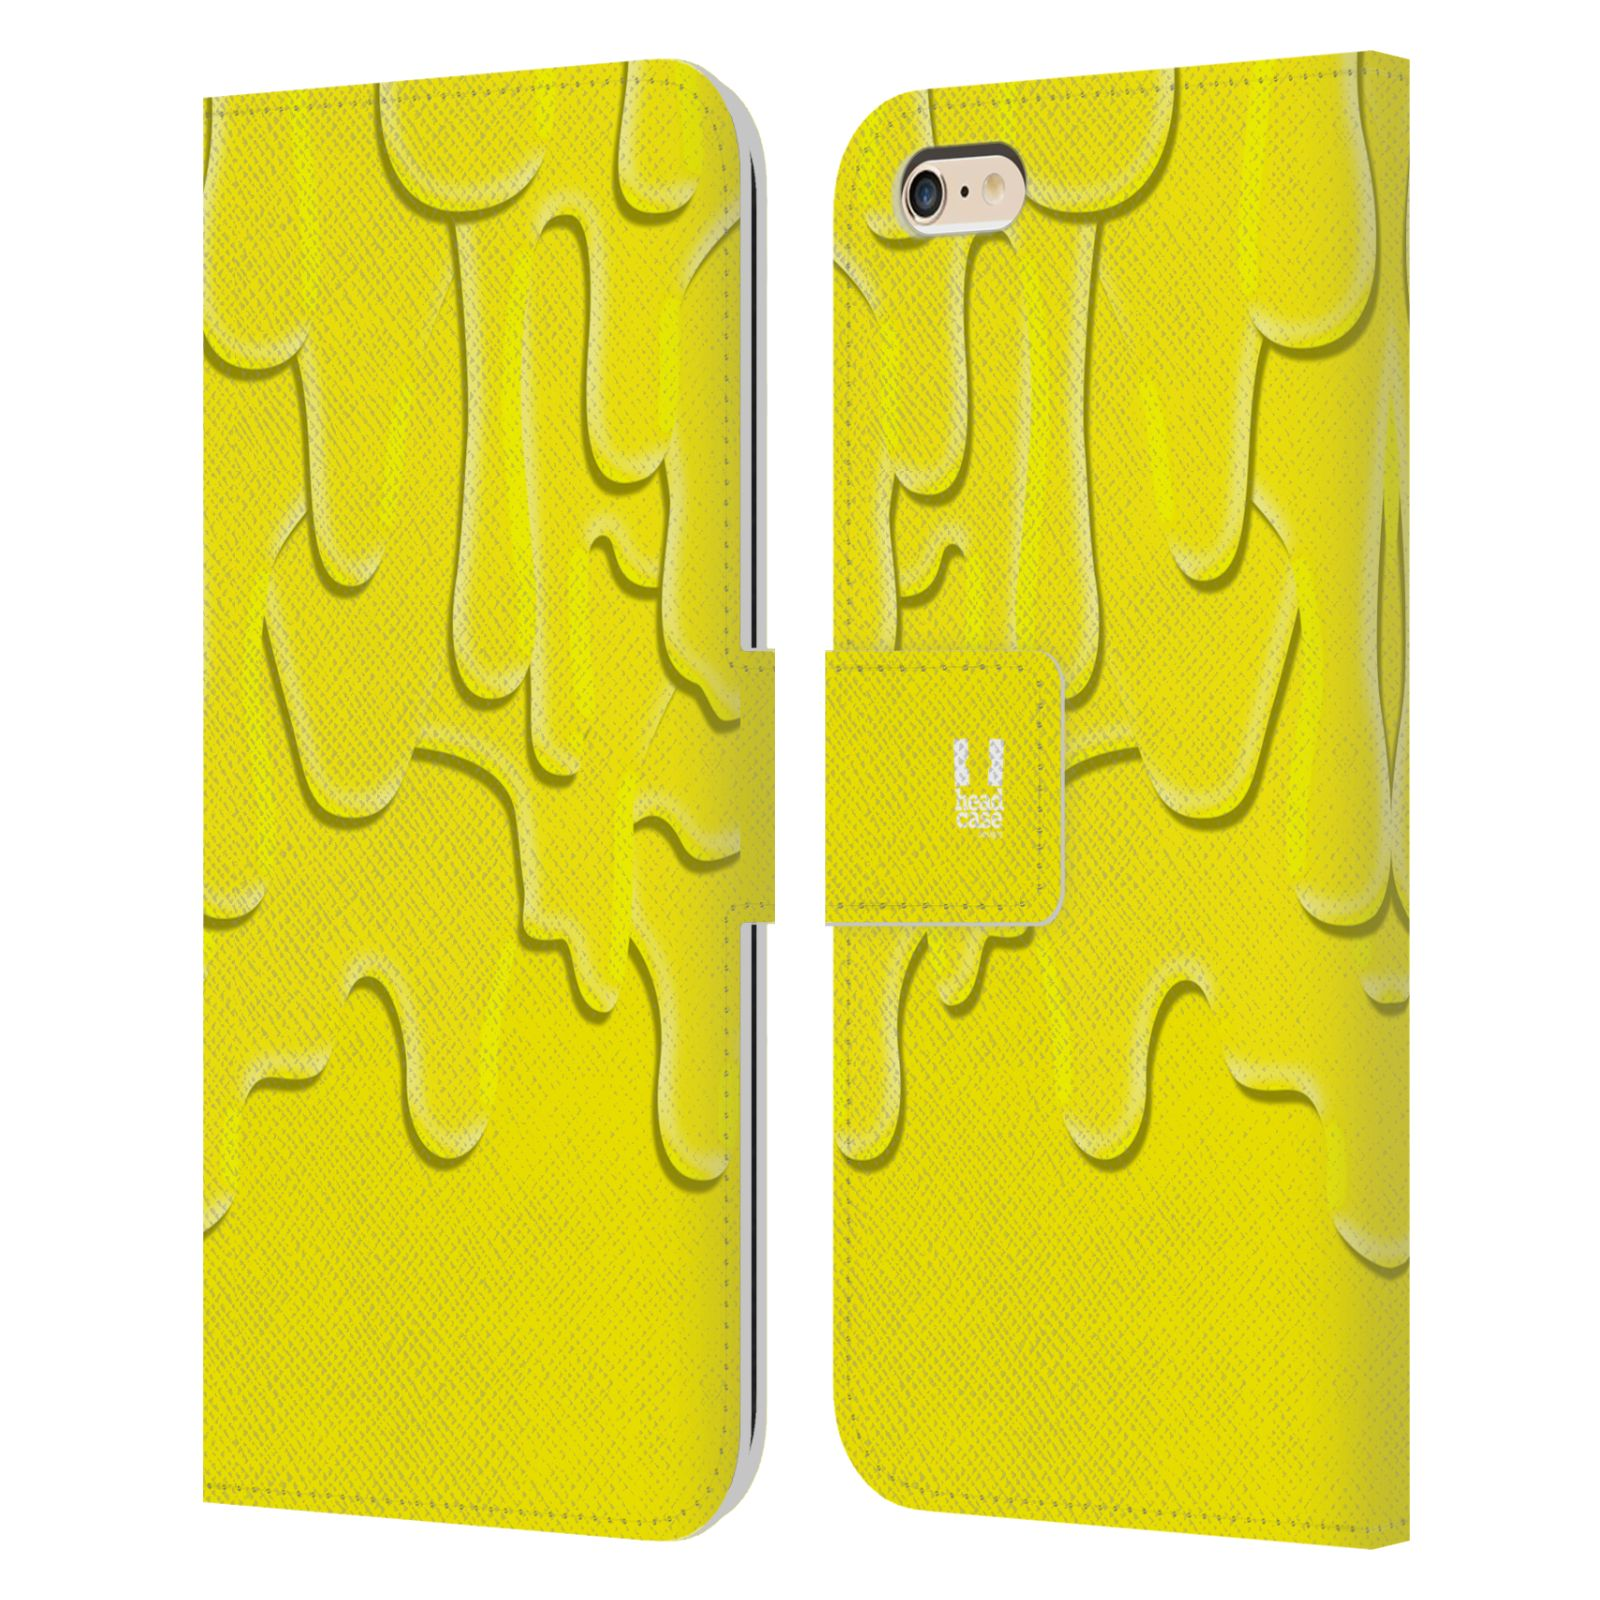 HEAD CASE Flipové pouzdro pro mobil Apple Iphone 6 PLUS / 6S PLUS ZÁPLAVA BARVA žlutá